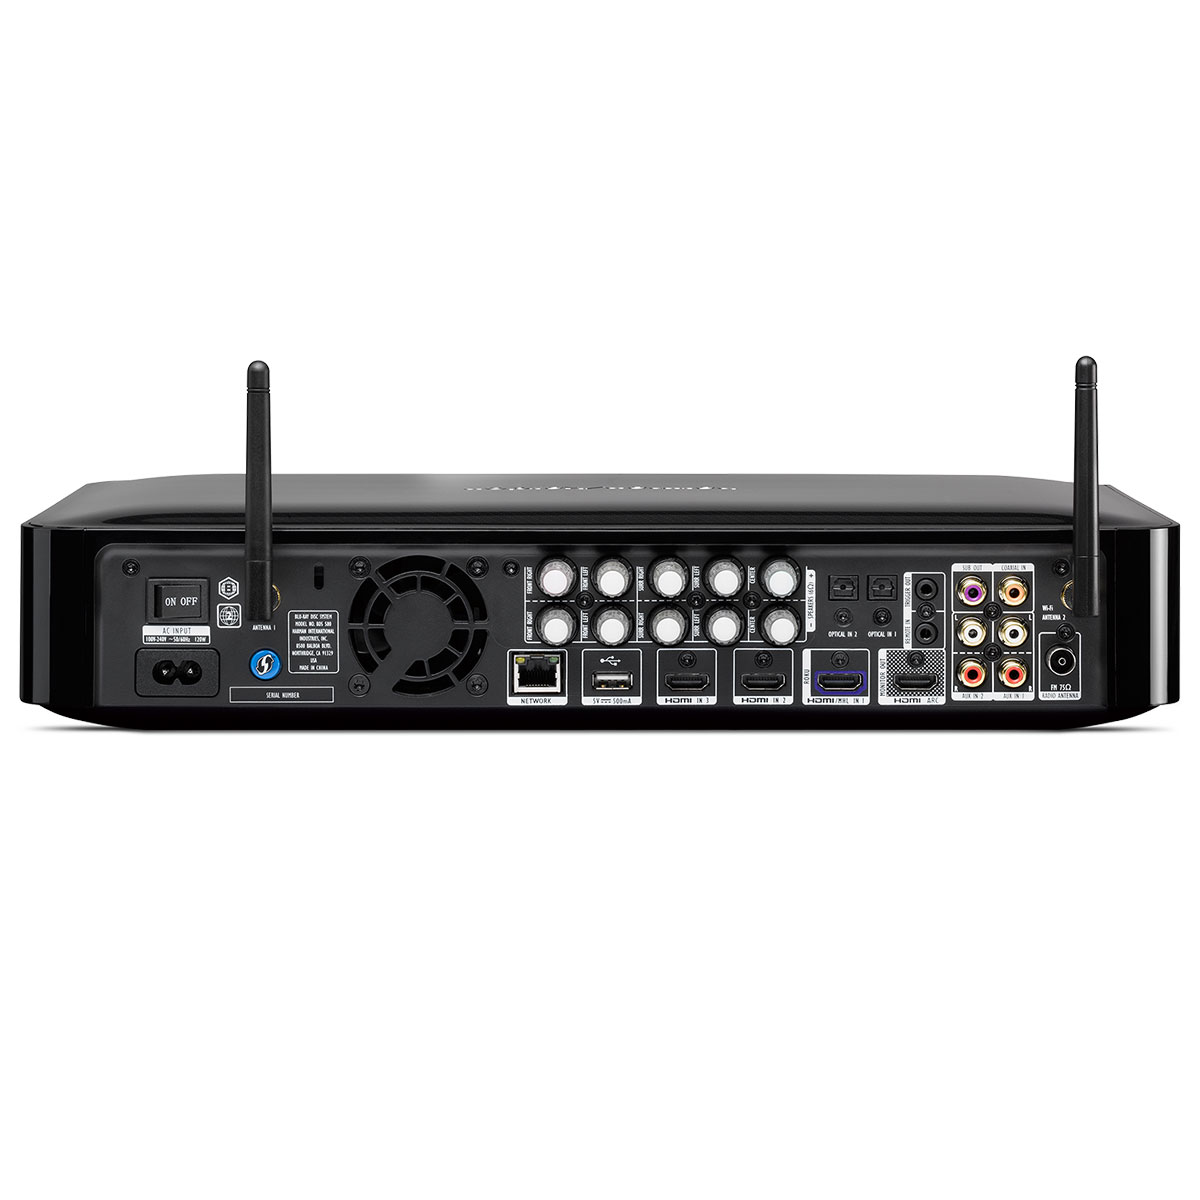 Receiver 5.1 Canais 3 HDMI c/ BLU RAY 3D, Wi-Fi  e Bluetooth BDS 580 BQ - Kardon